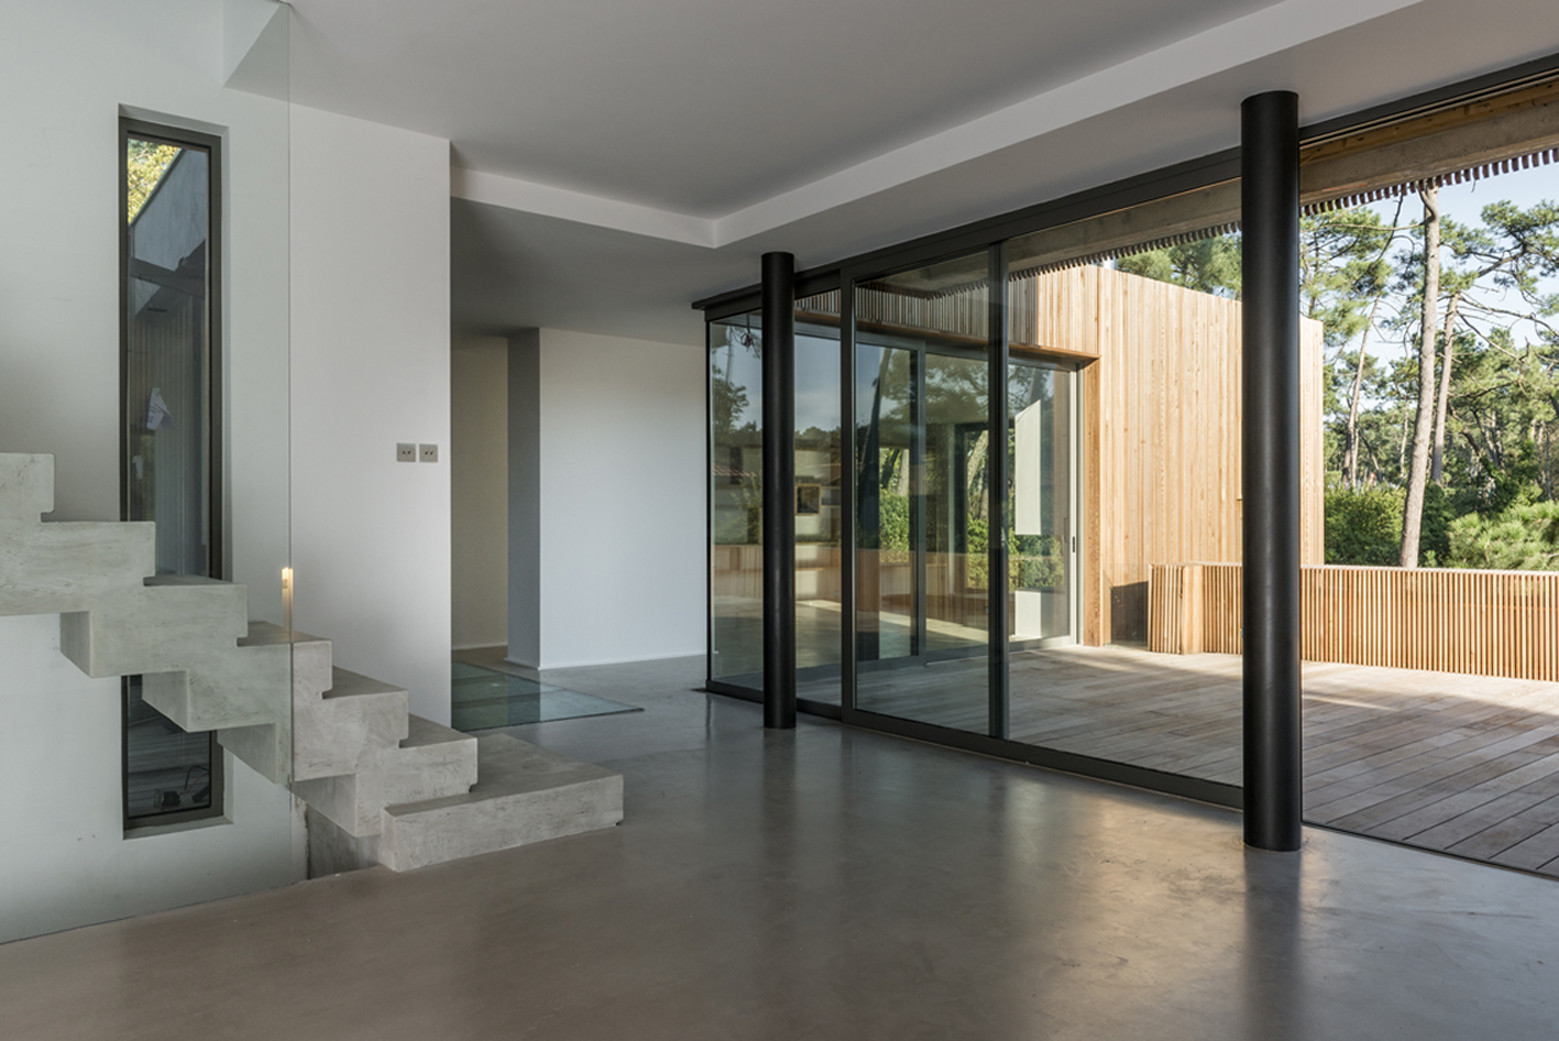 Gallery of villa chiberta atelier delphine carrere 2 - Maison avec jardin interieur ...